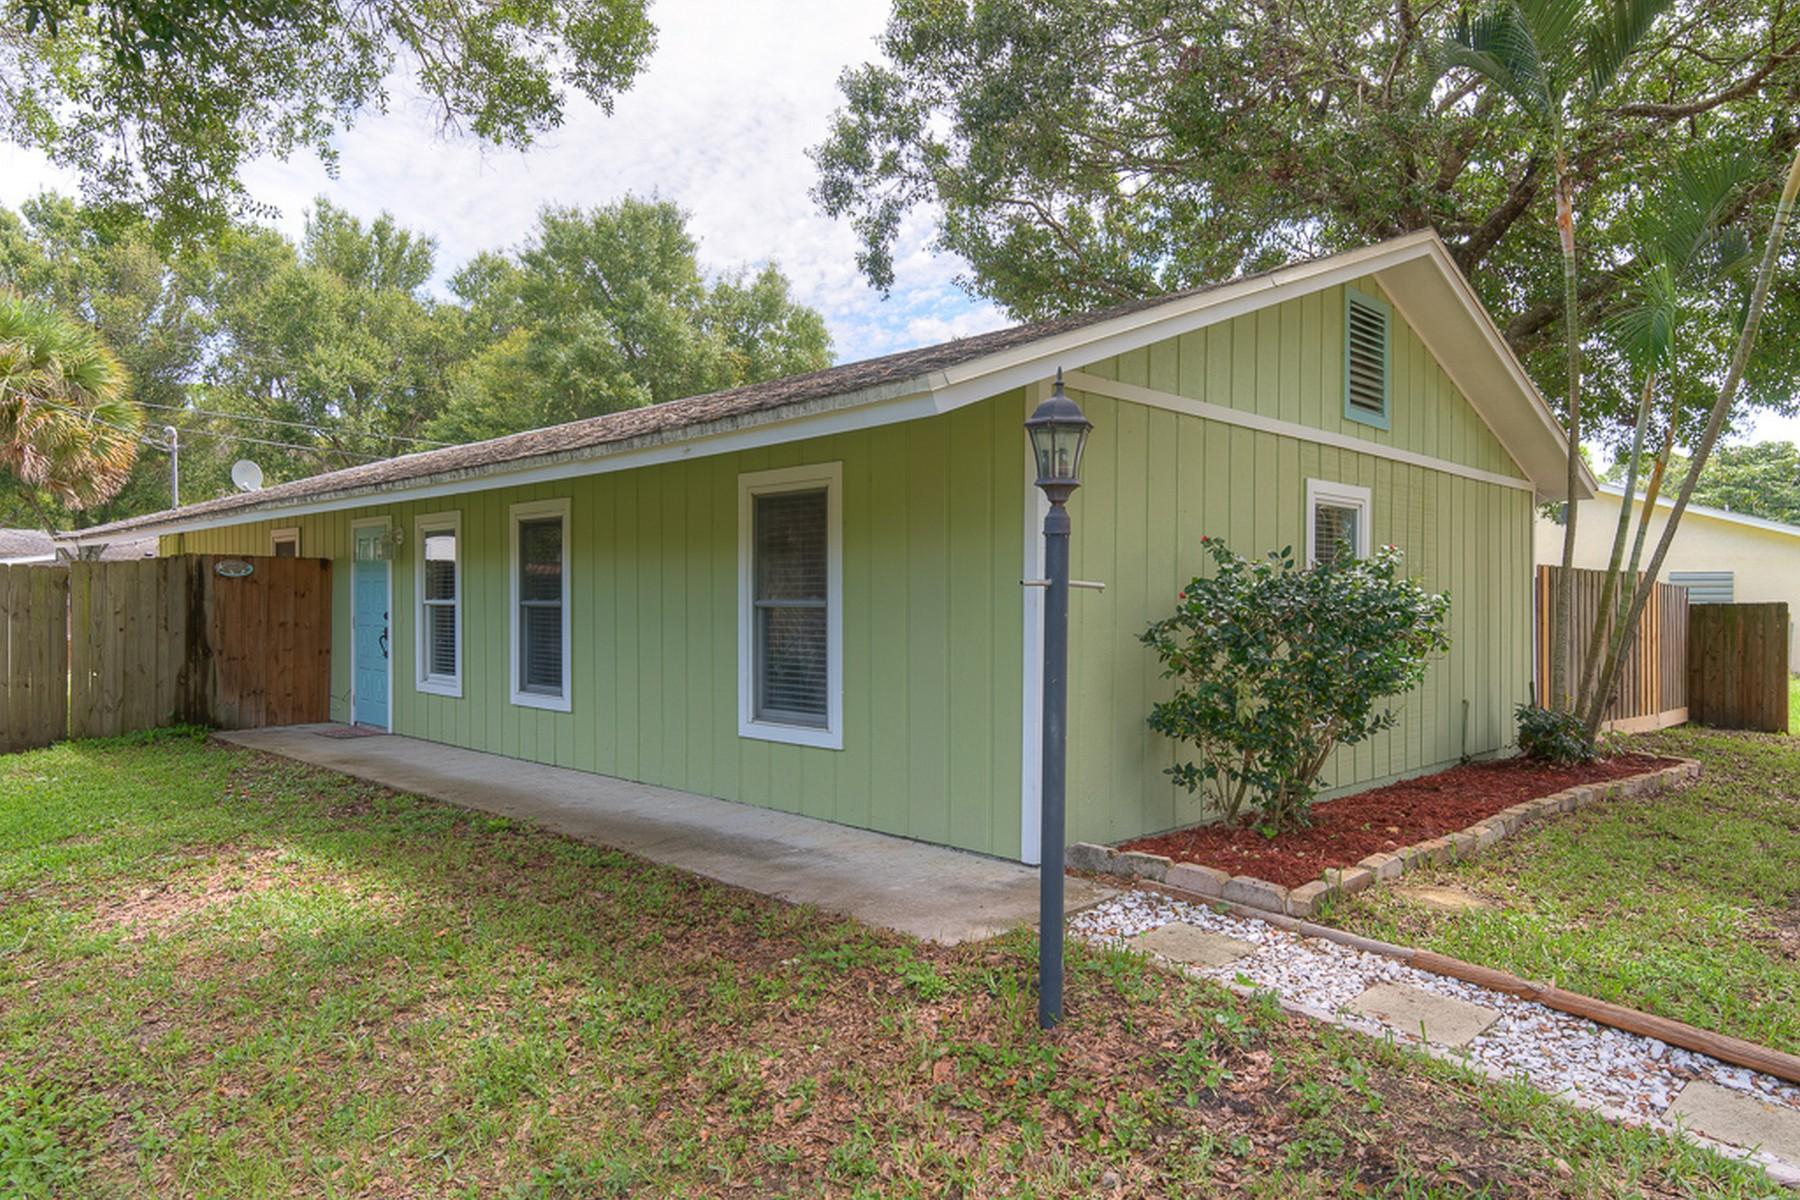 Villa per Vendita alle ore Adorable Key West Style Bungalow 3320 2nd Street Vero Beach, Florida, 32968 Stati Uniti